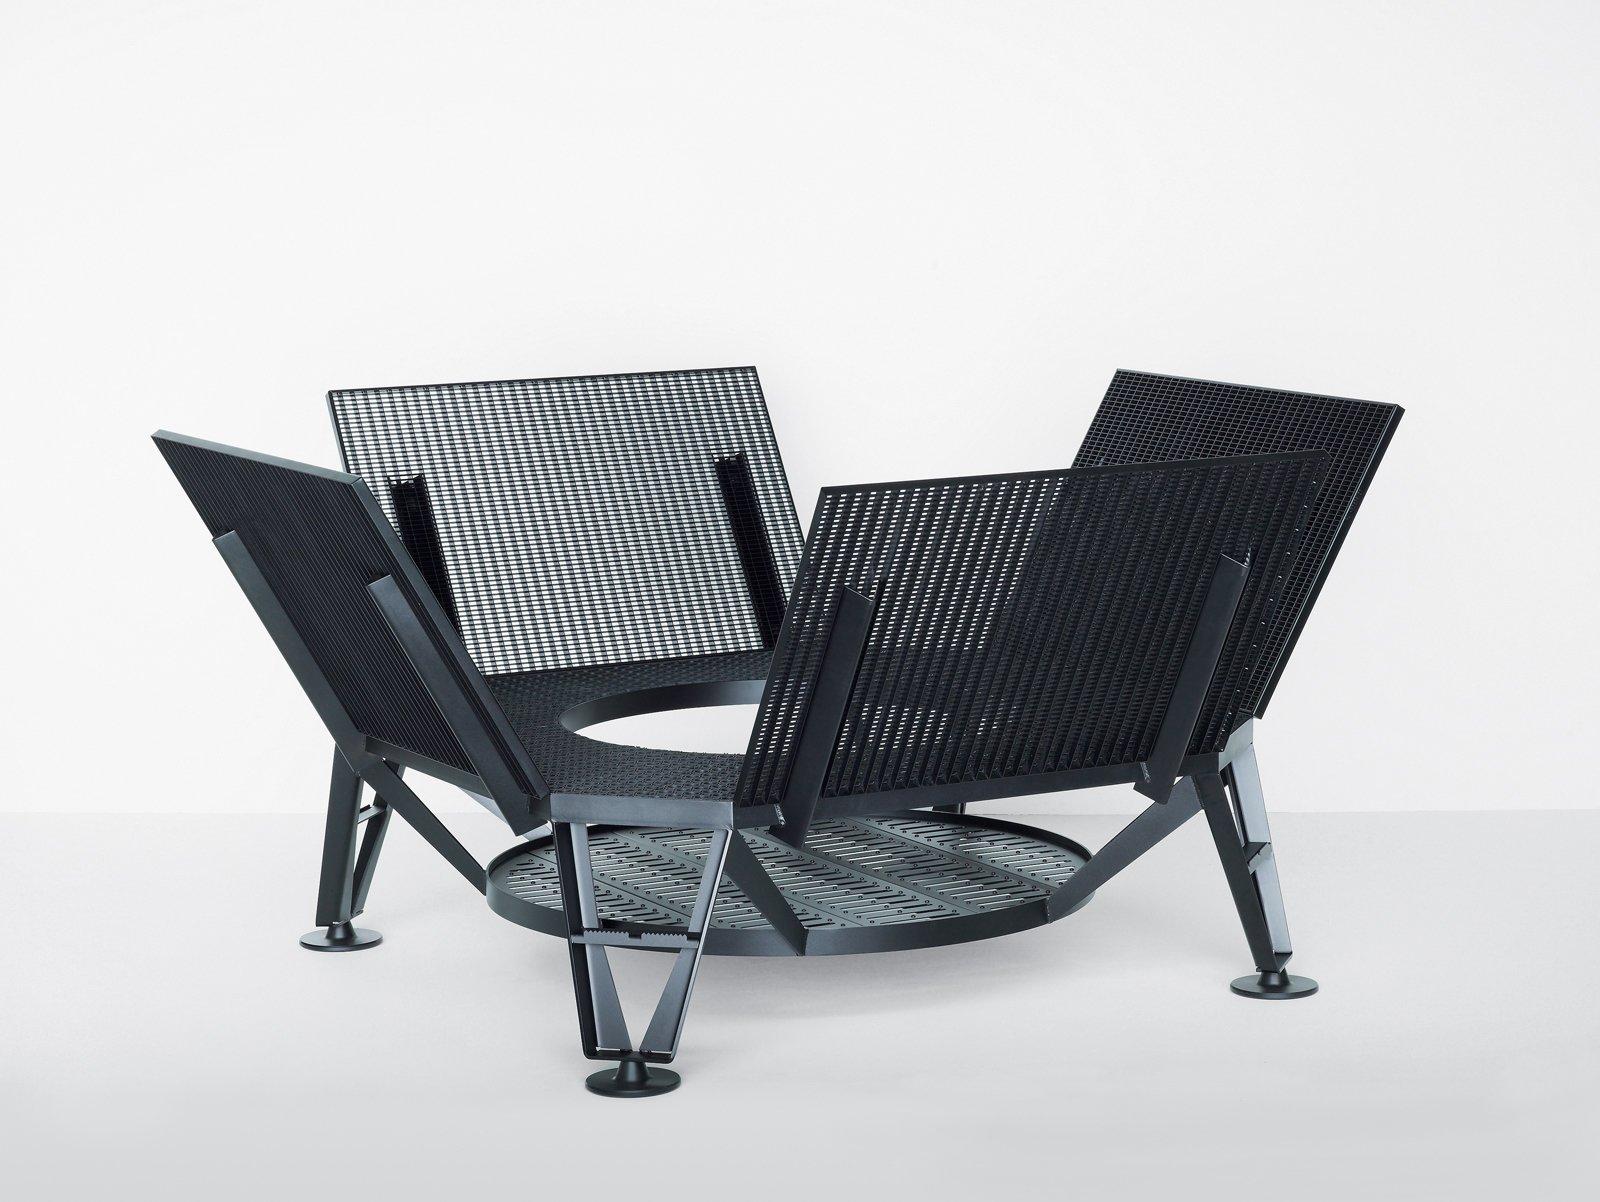 Landen public seating for Vitra Edition, 2007.  Photo 6 of 26 in Industrial Designer Focus: Konstantin Grcic